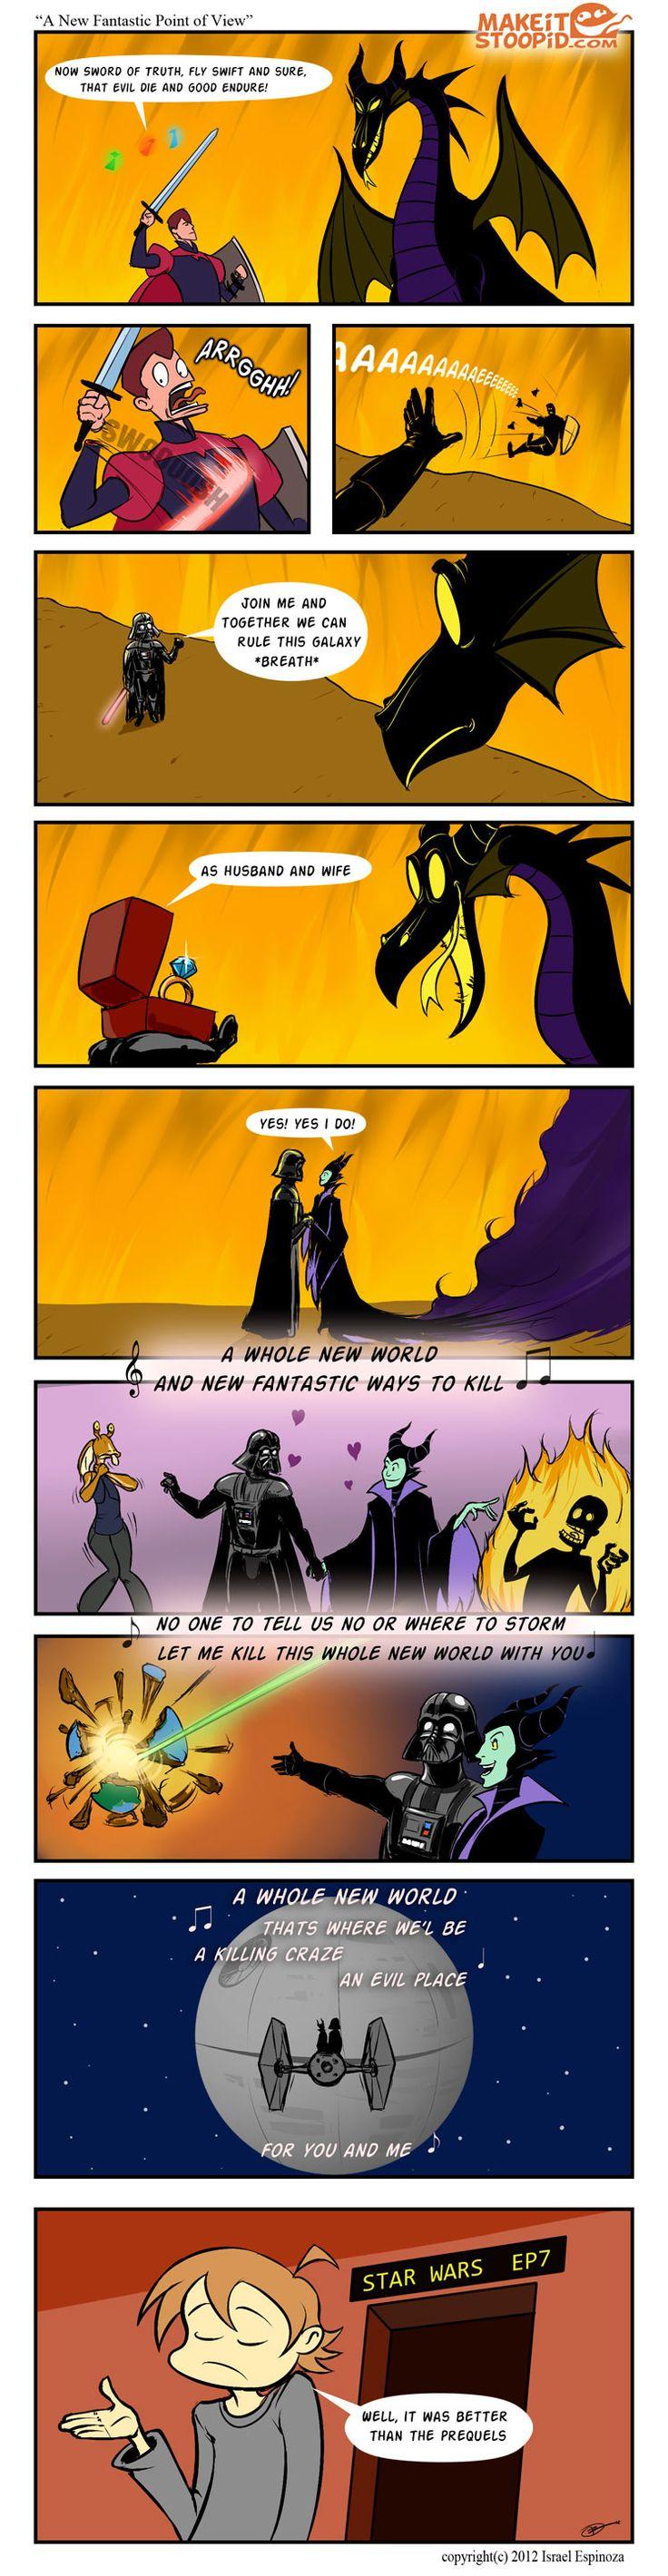 Disney's Star Wars. -D